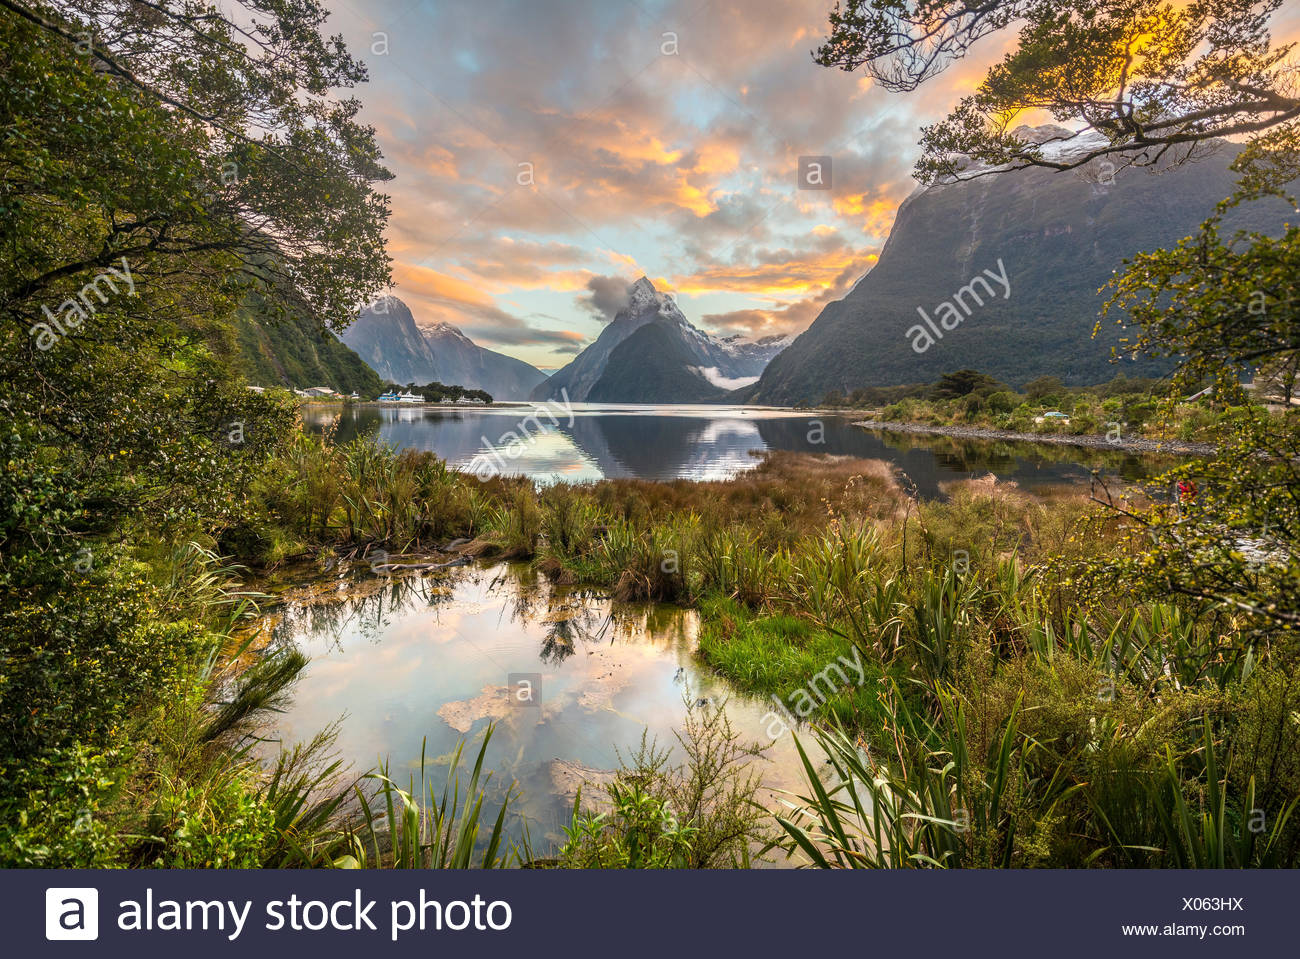 Mitre Peak, Sunset, Milford Sound, Fiordland National Park, Te Anau, Southland Region, Southland, New Zealand, Oceania - Stock Image